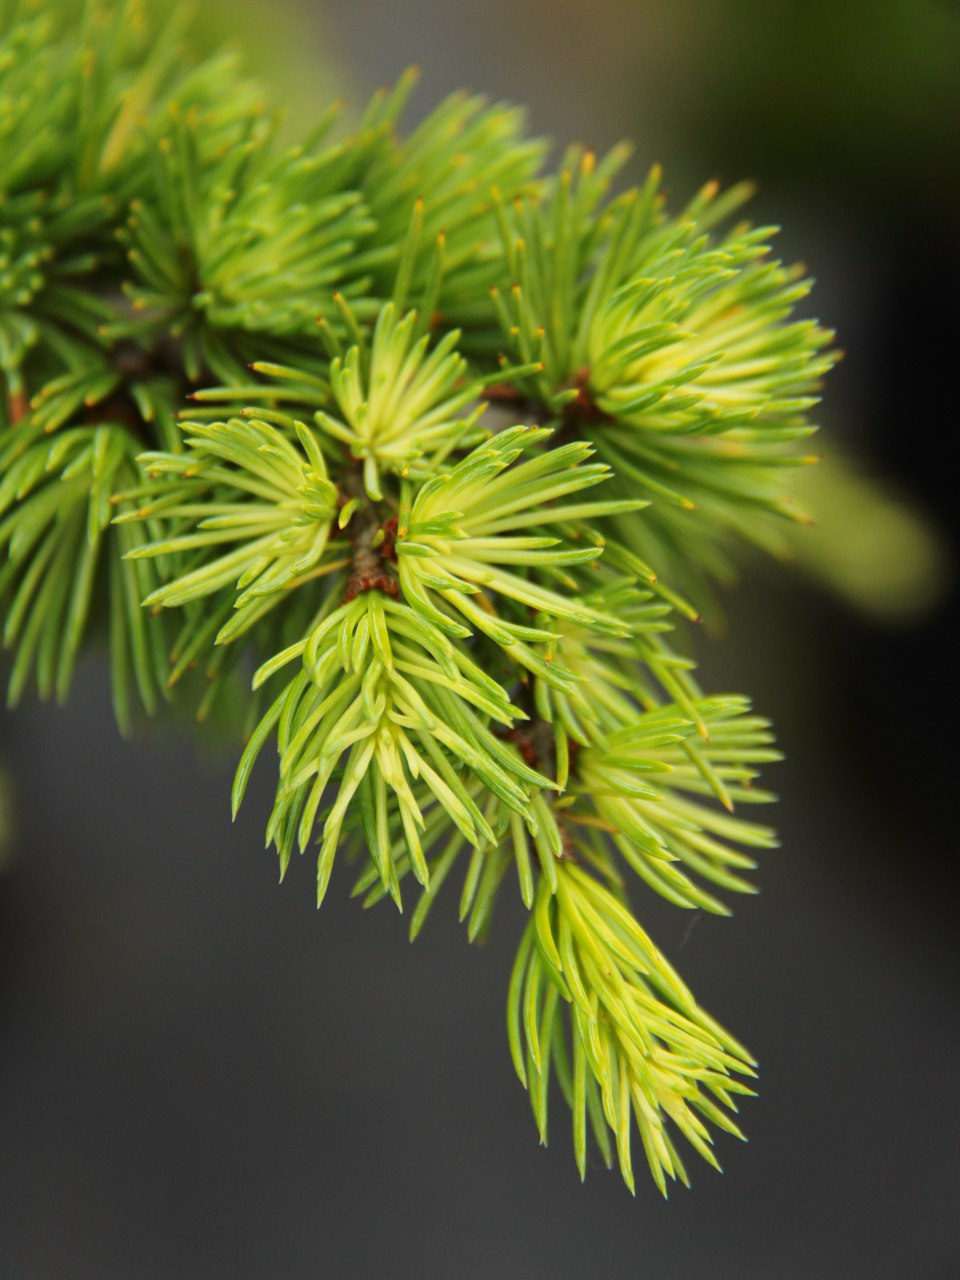 Cedrus atlantica Silberspitz Atlas cedar evergreen conifer silver blue green needles